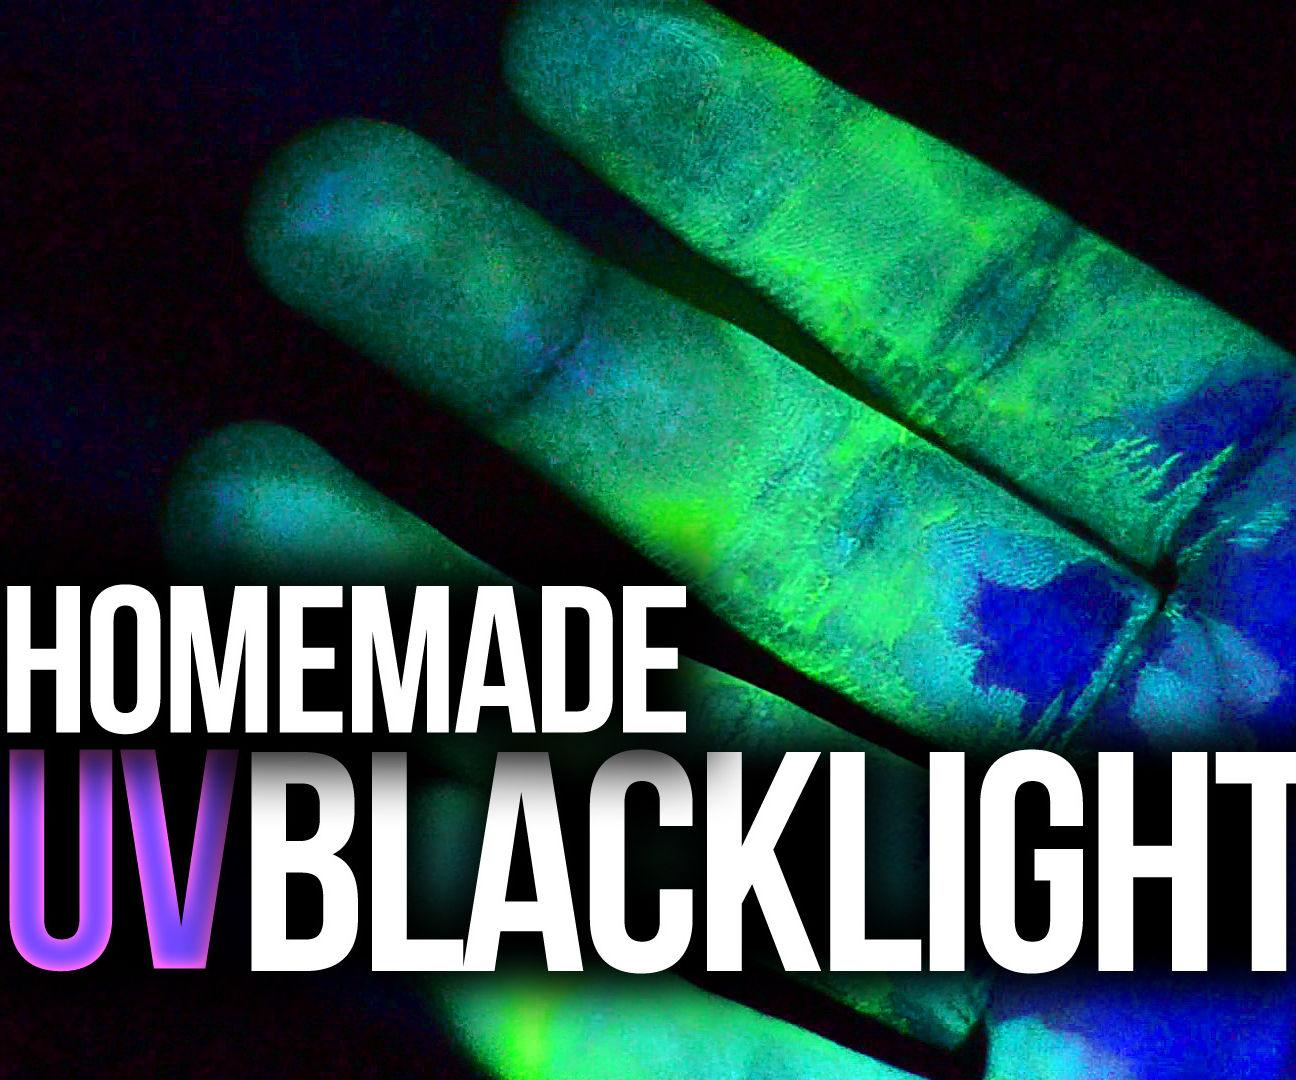 Make a UV black light at home